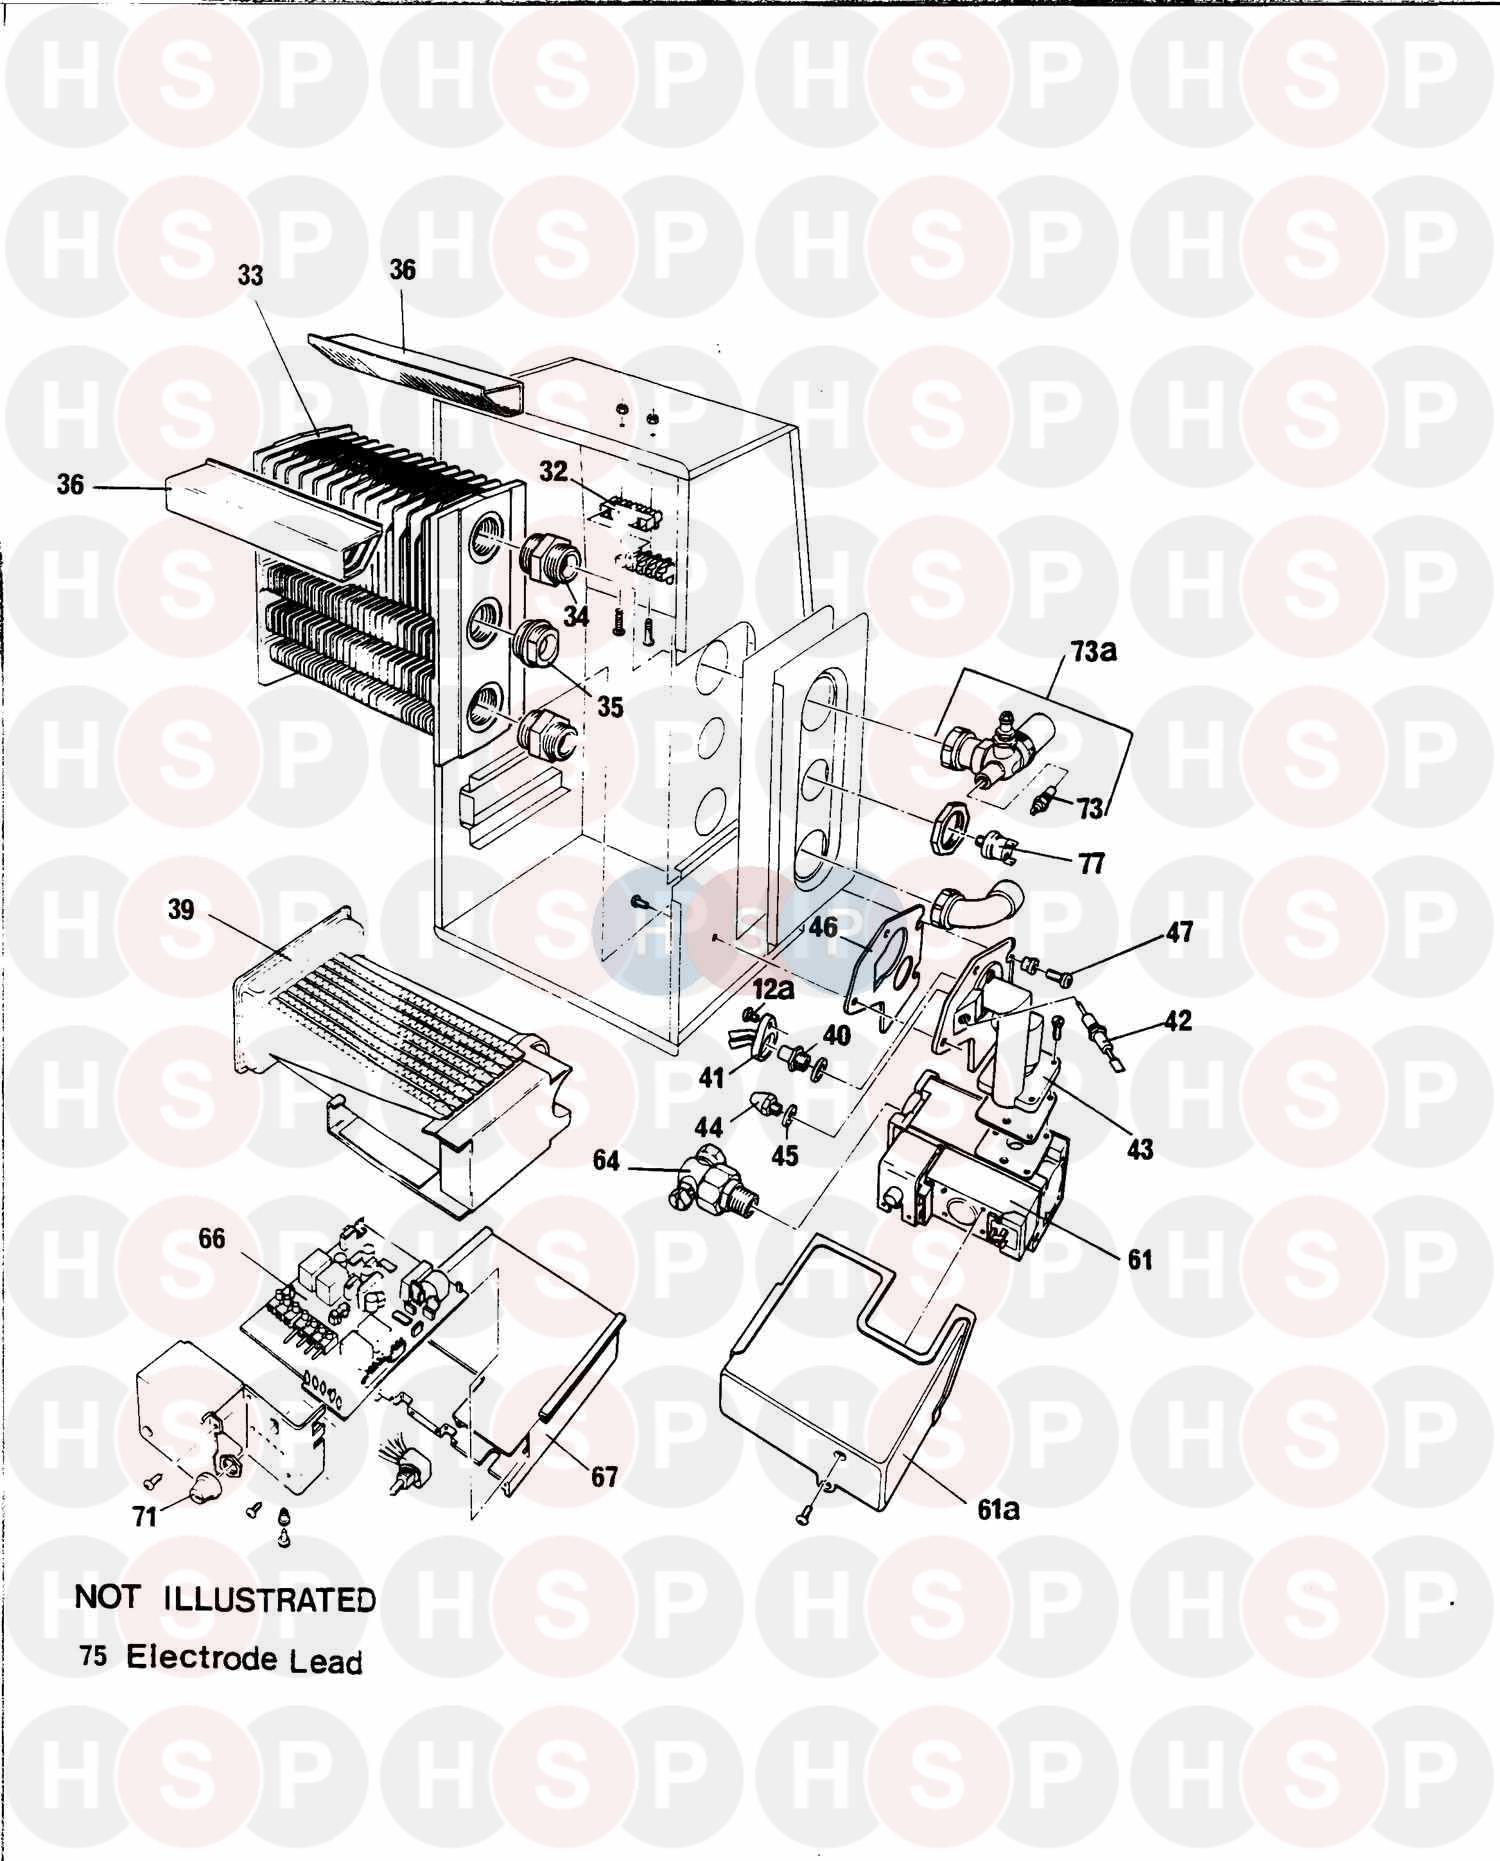 Baxi SOLO 2 PF 50 (Boiler / Combustion Box) Diagram